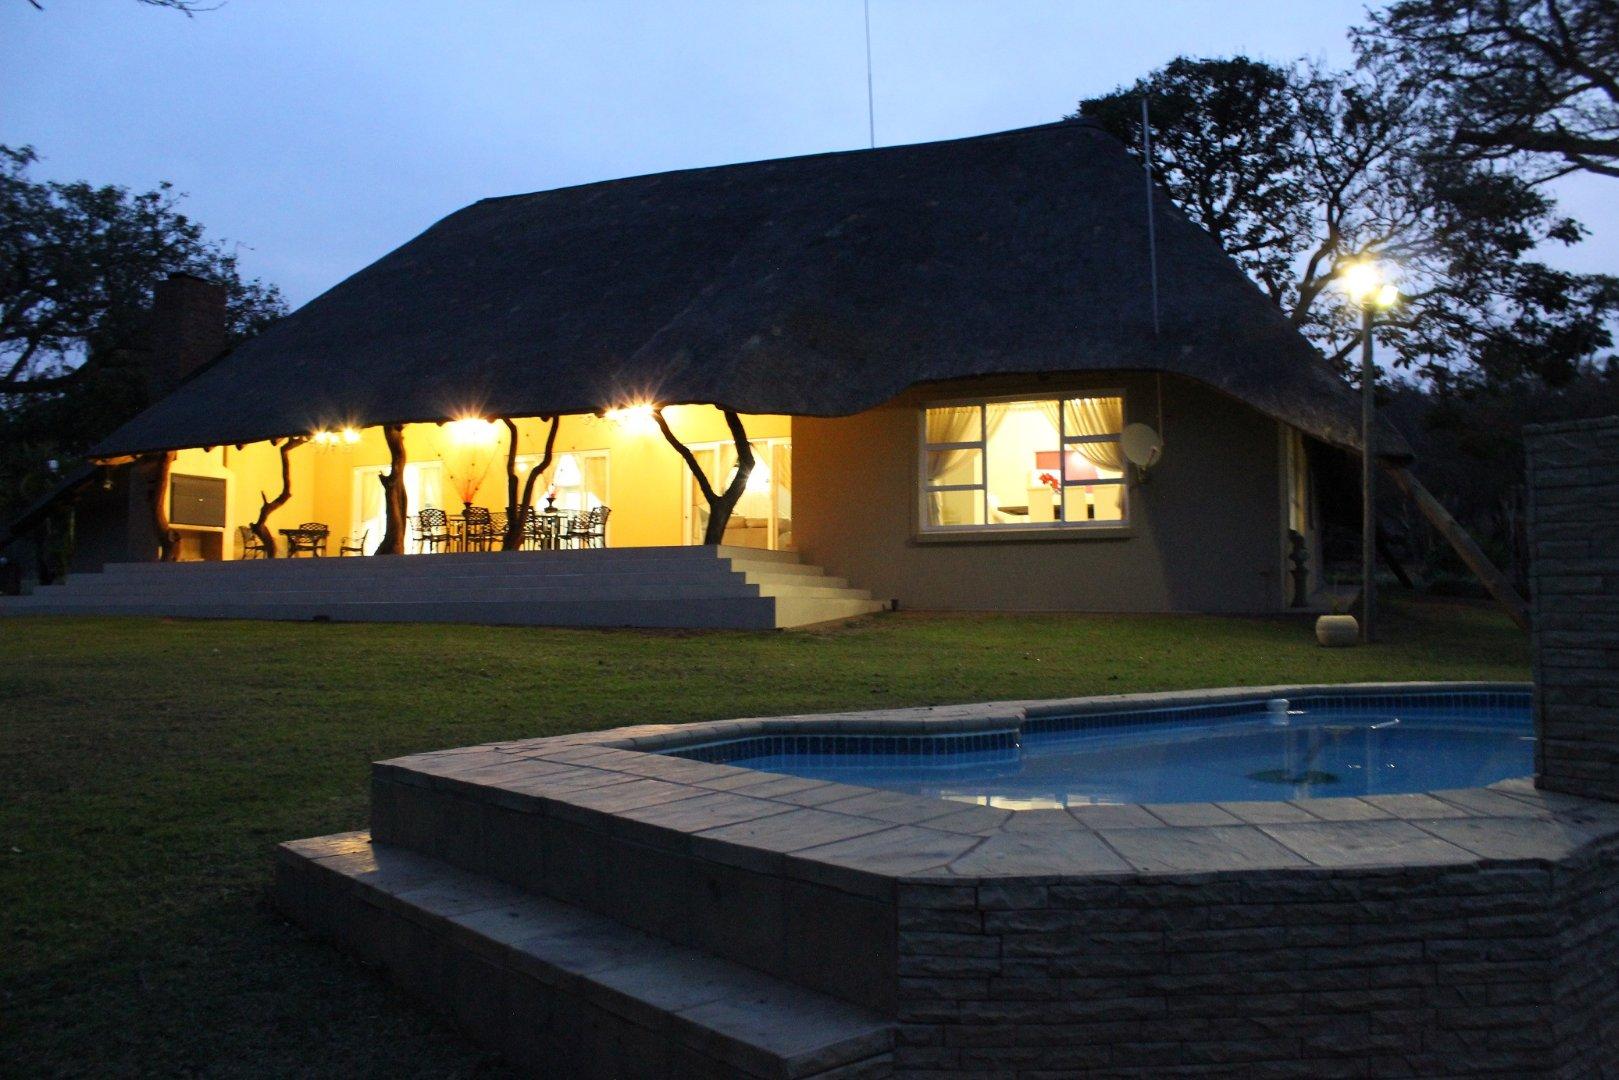 Modimolle, Modimolle Property  | Houses For Sale Modimolle, Modimolle, Farms 7 bedrooms property for sale Price:8,200,000